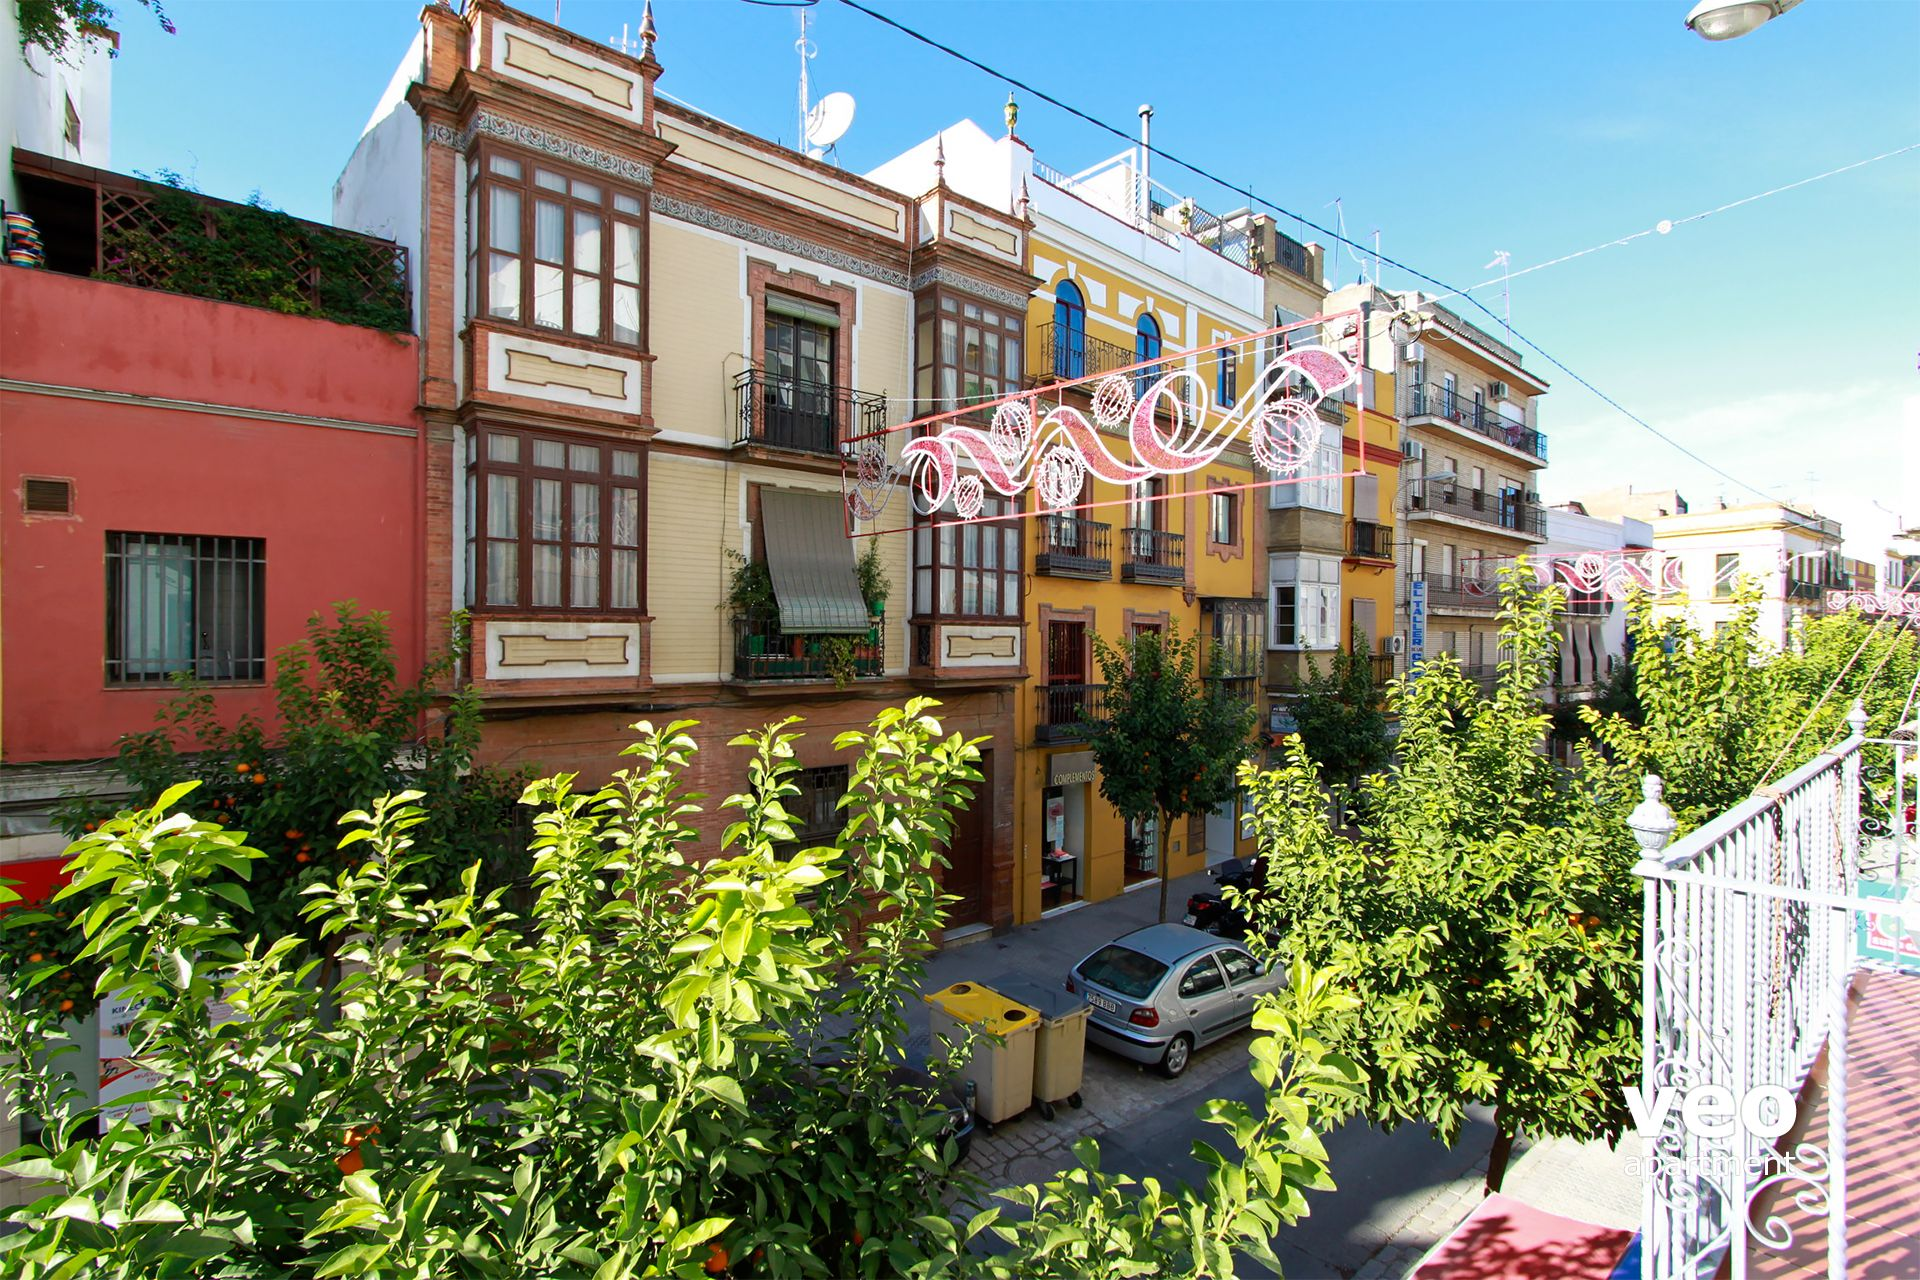 Apartment Mieten Feria Strasse Sevilla Spanien Feria 2a